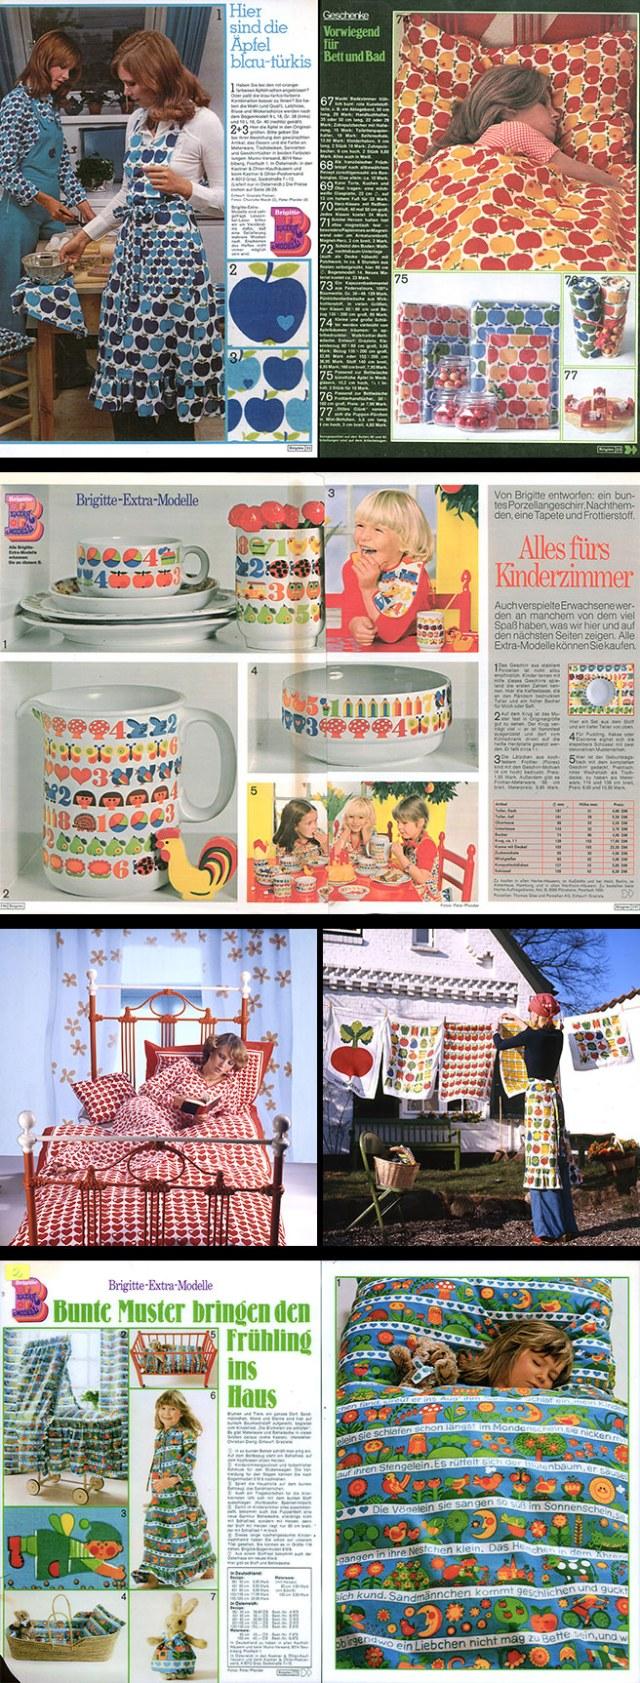 Mosaic of Graziela Preiser designs